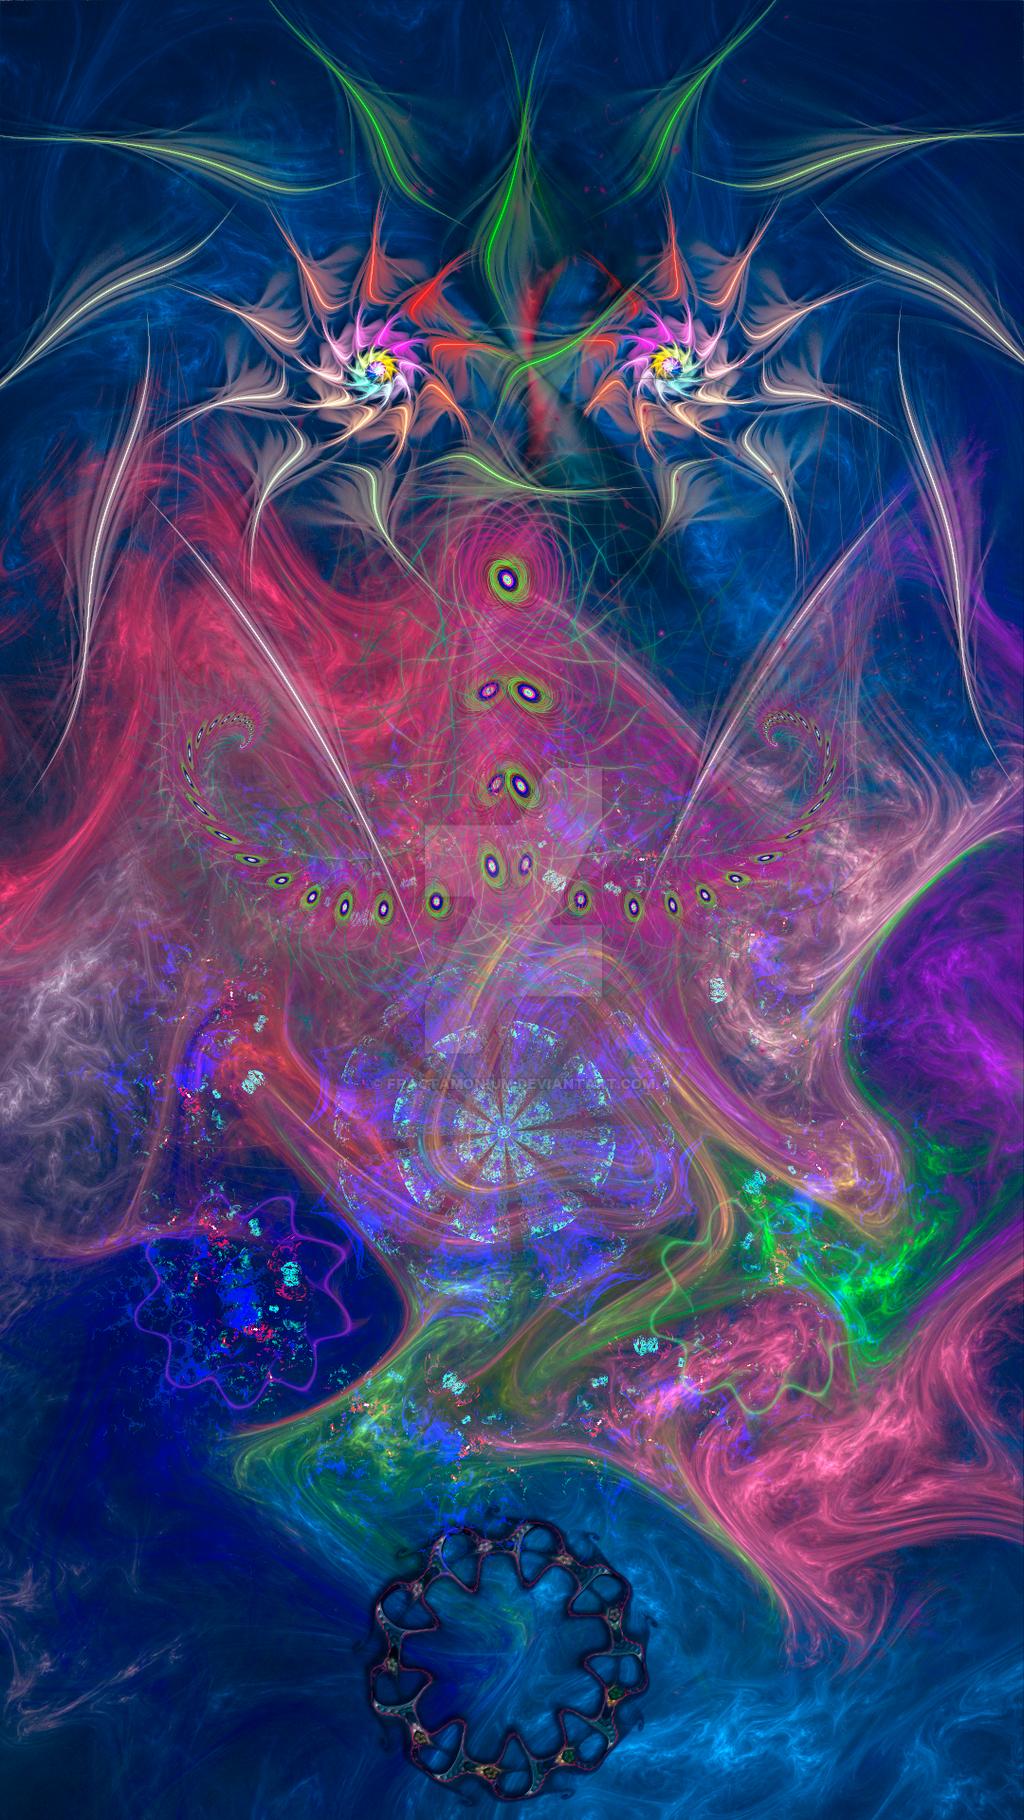 Sky Dreams by Fractamonium